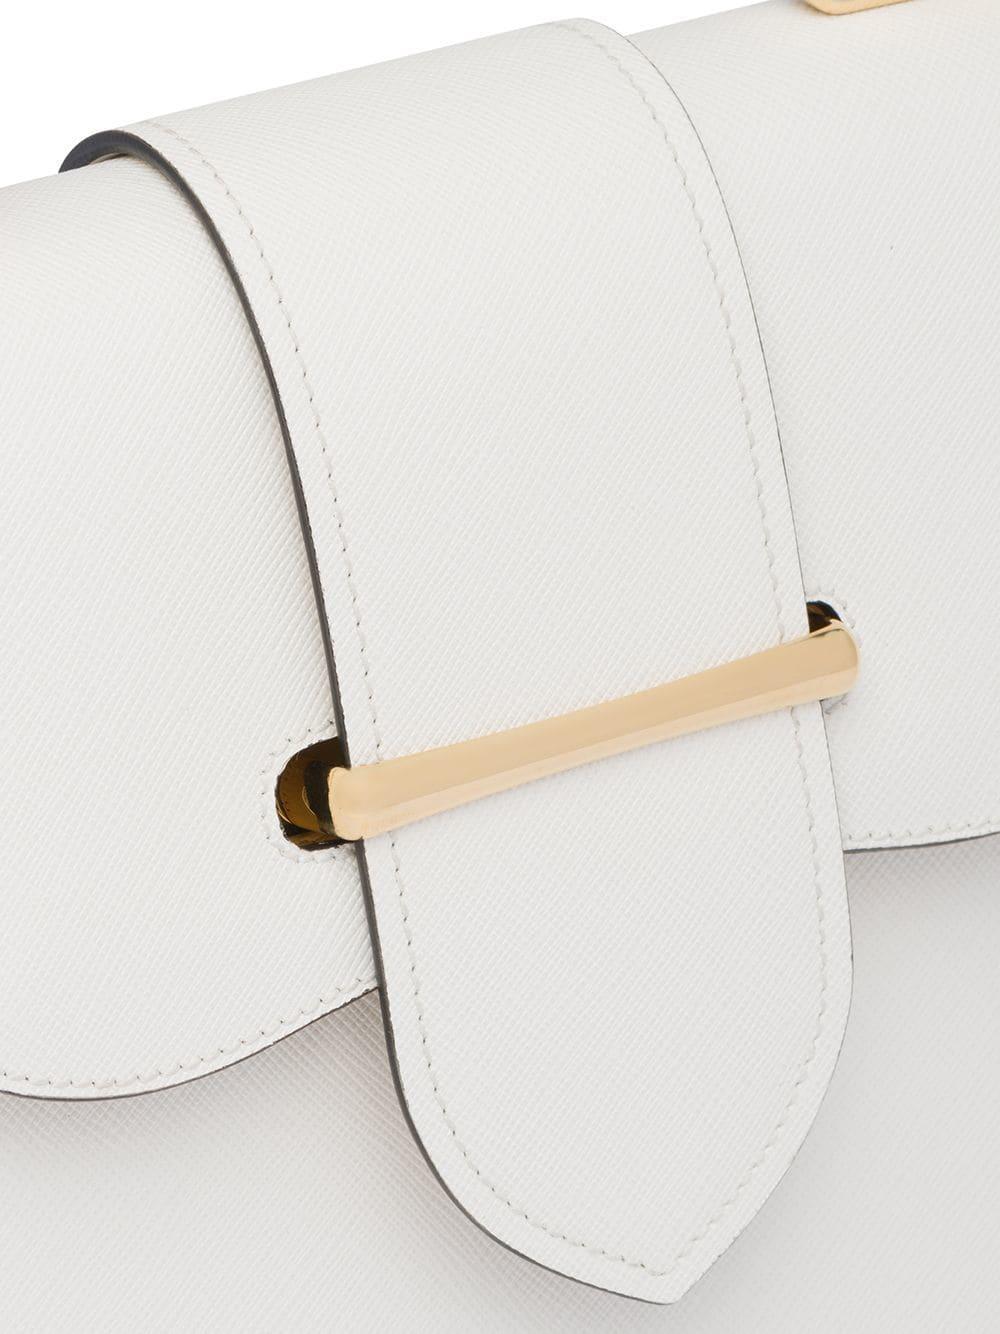 732d5e2664e8 Lyst - Prada Sidonie Medium Saffiano Bag in White